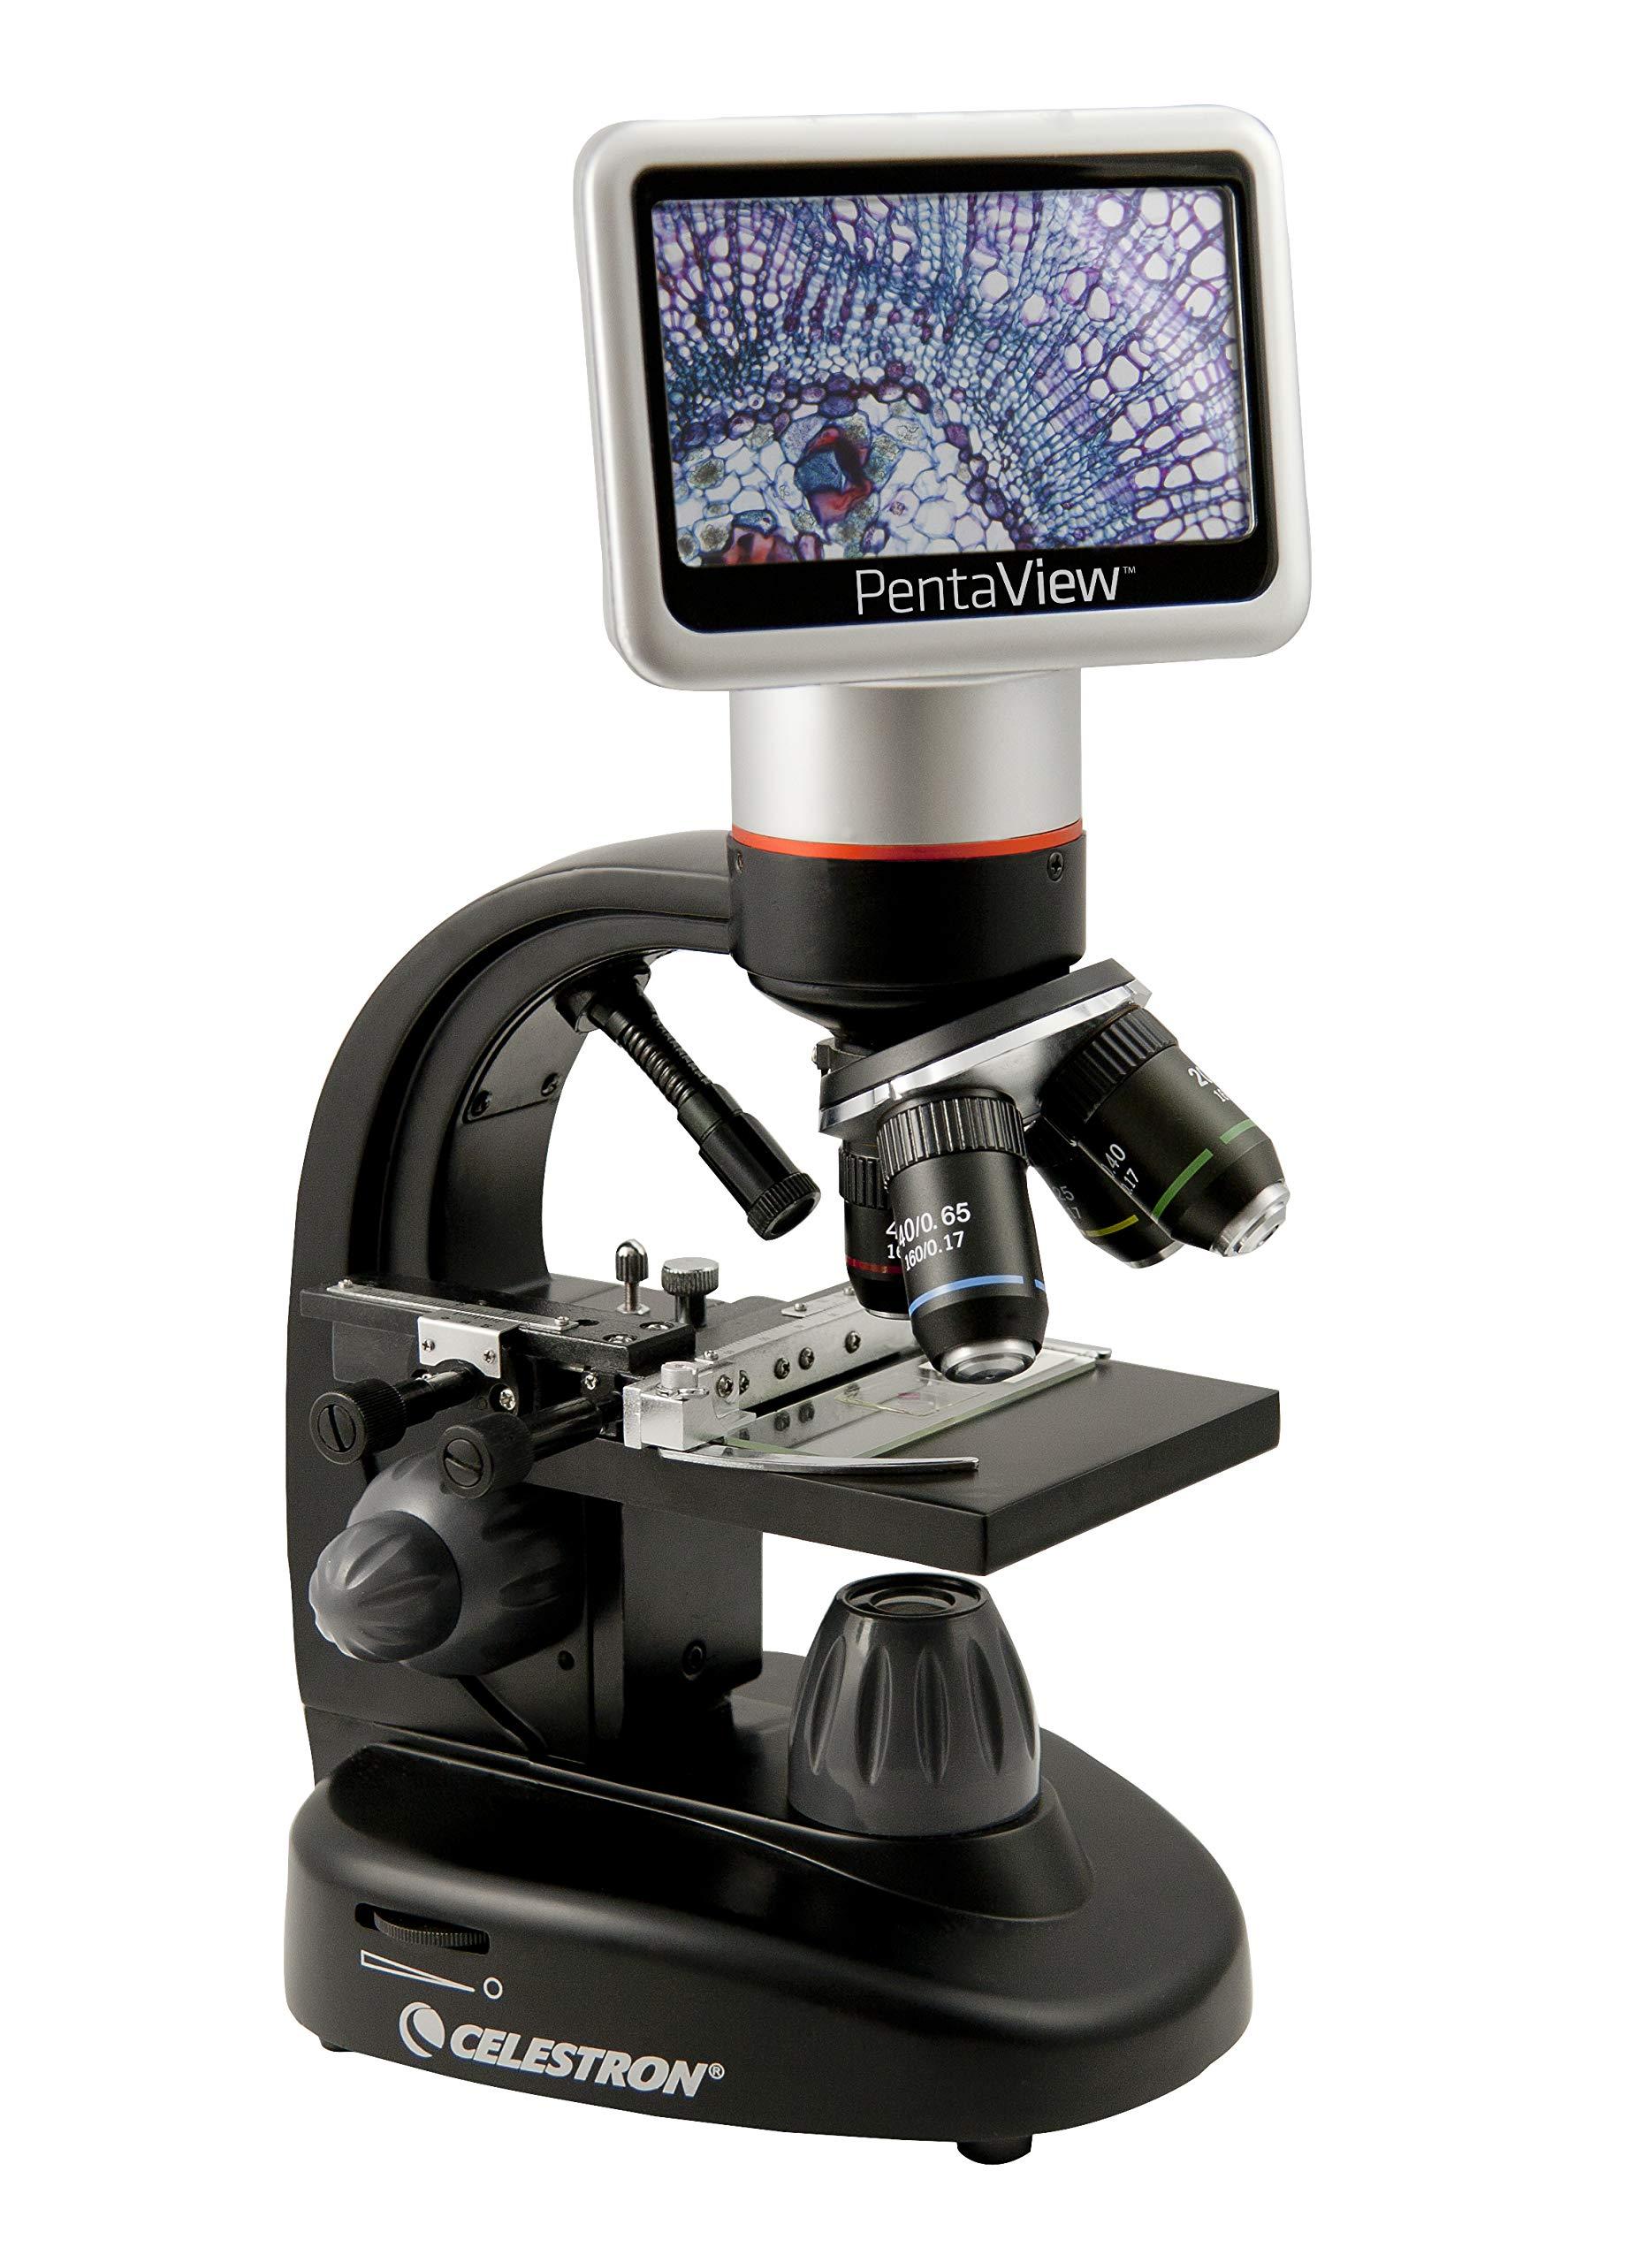 Celestron PentaView 5 MP LCD Digital Microscope by Celestron